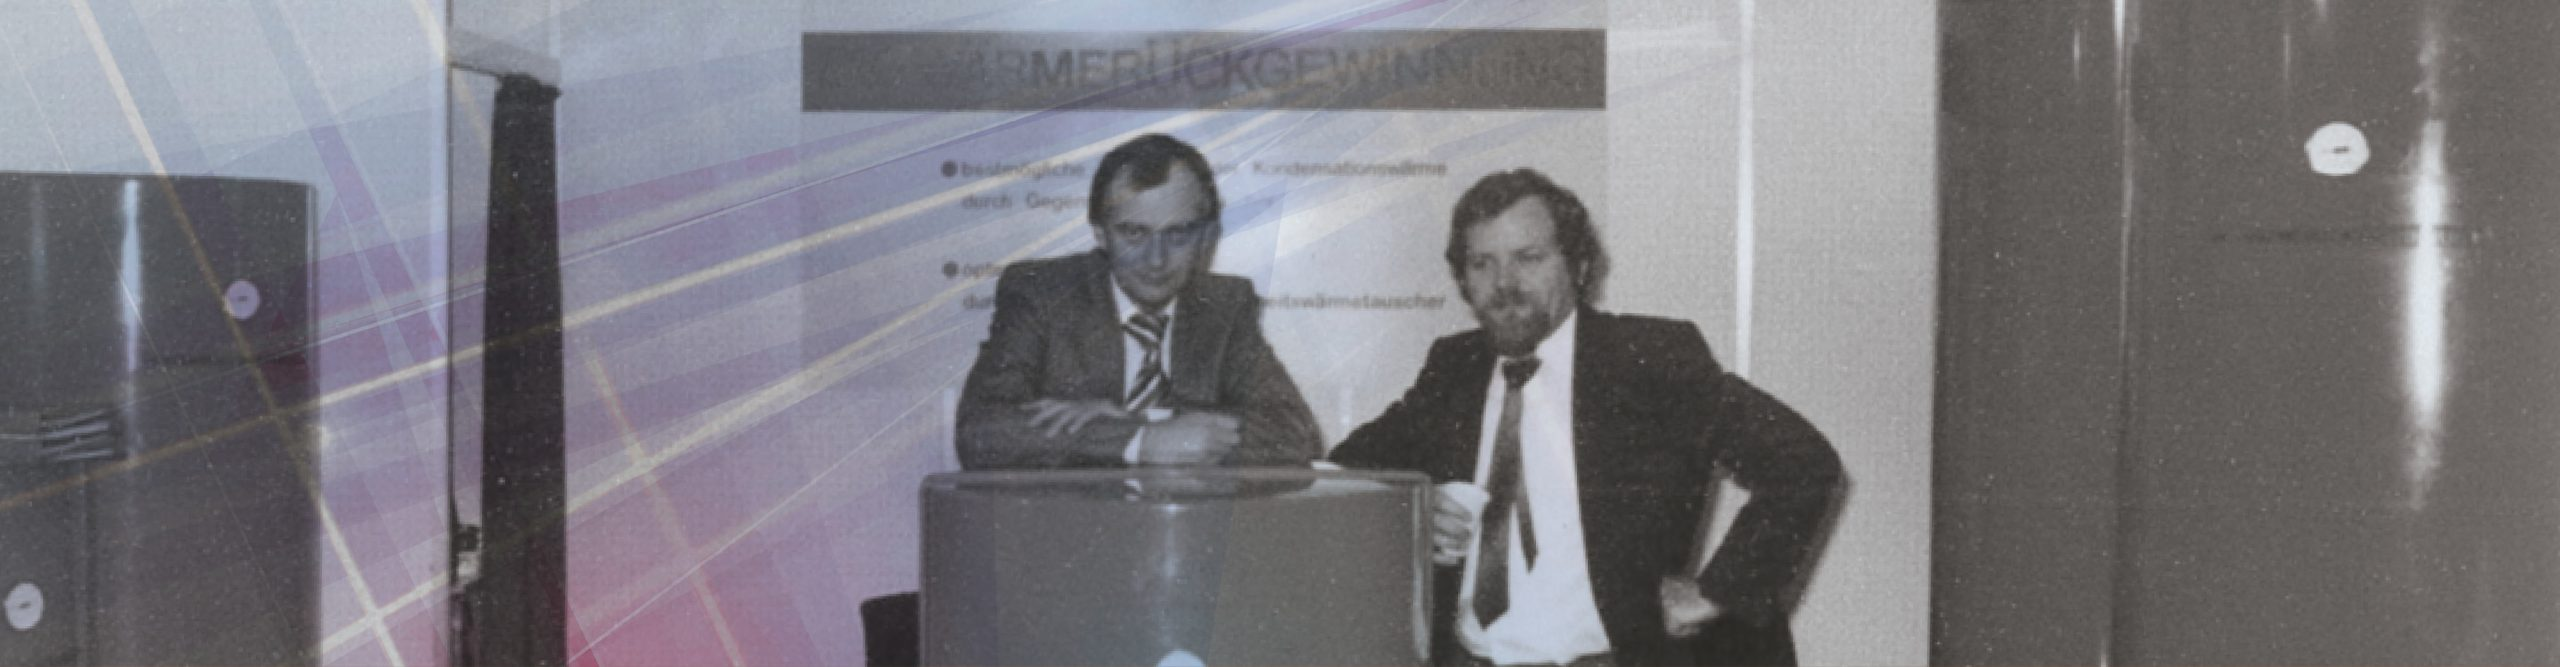 https://www.dk-kaelteanlagen.de/wp-content/uploads/historie-banner-scaled.jpg